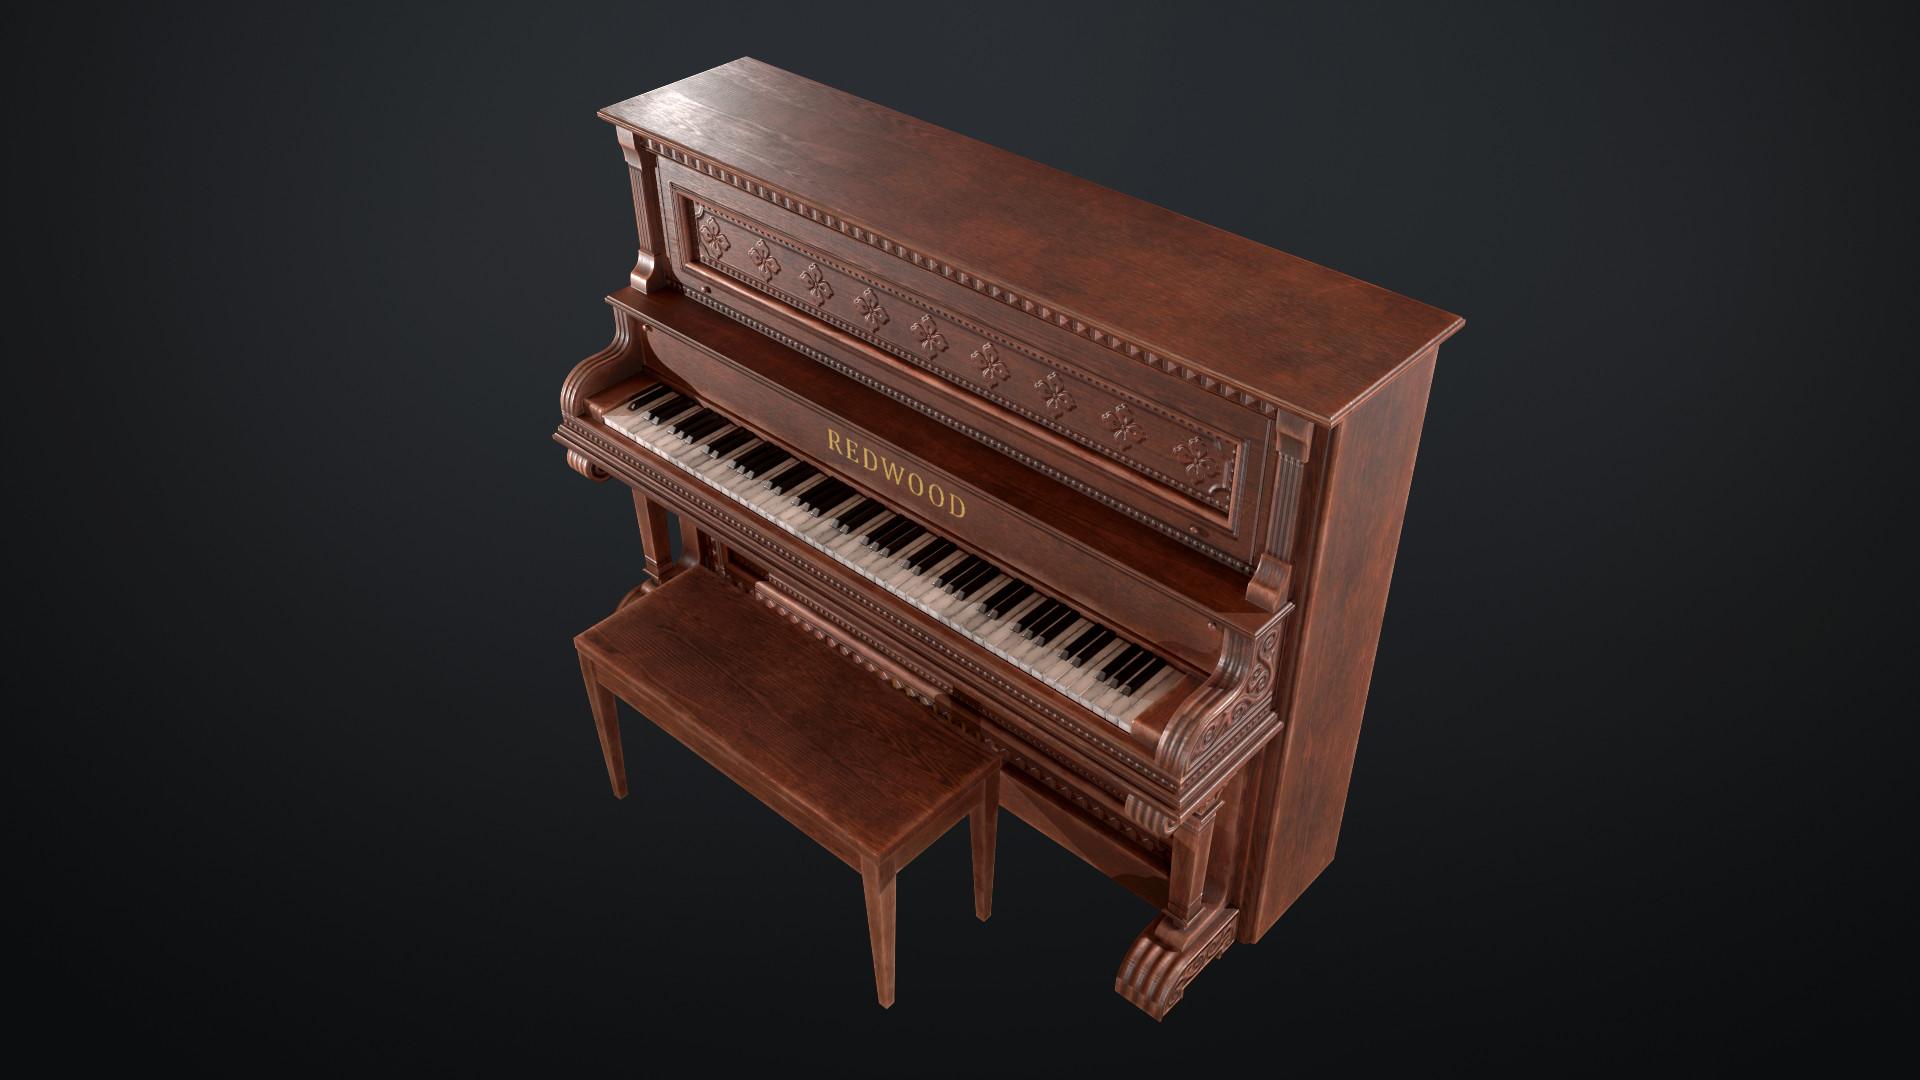 Sami tarvainen piano render 3